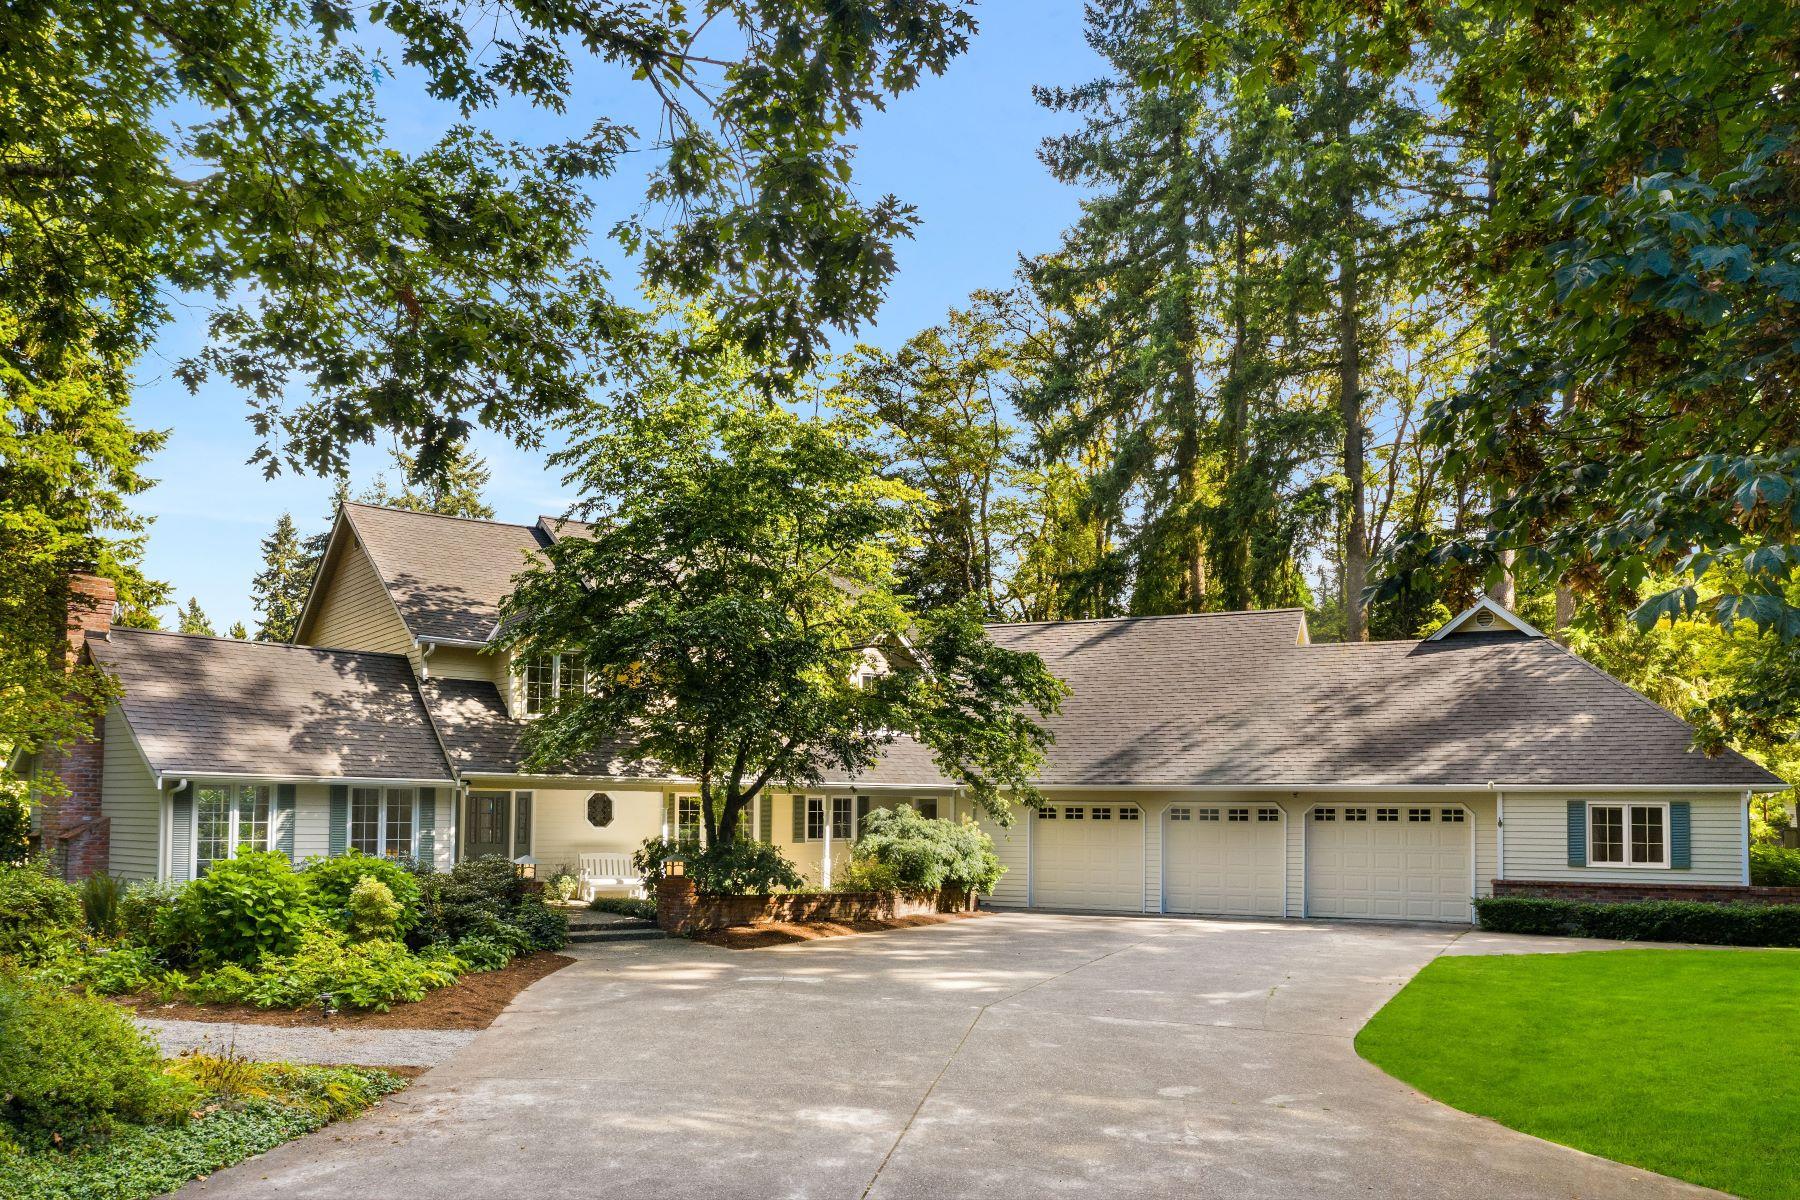 Single Family Homes for Sale at 6110 208th Avenue Northeast, Redmond, WA 98053 6110 208th Ave NE Redmond, Washington 98053 United States